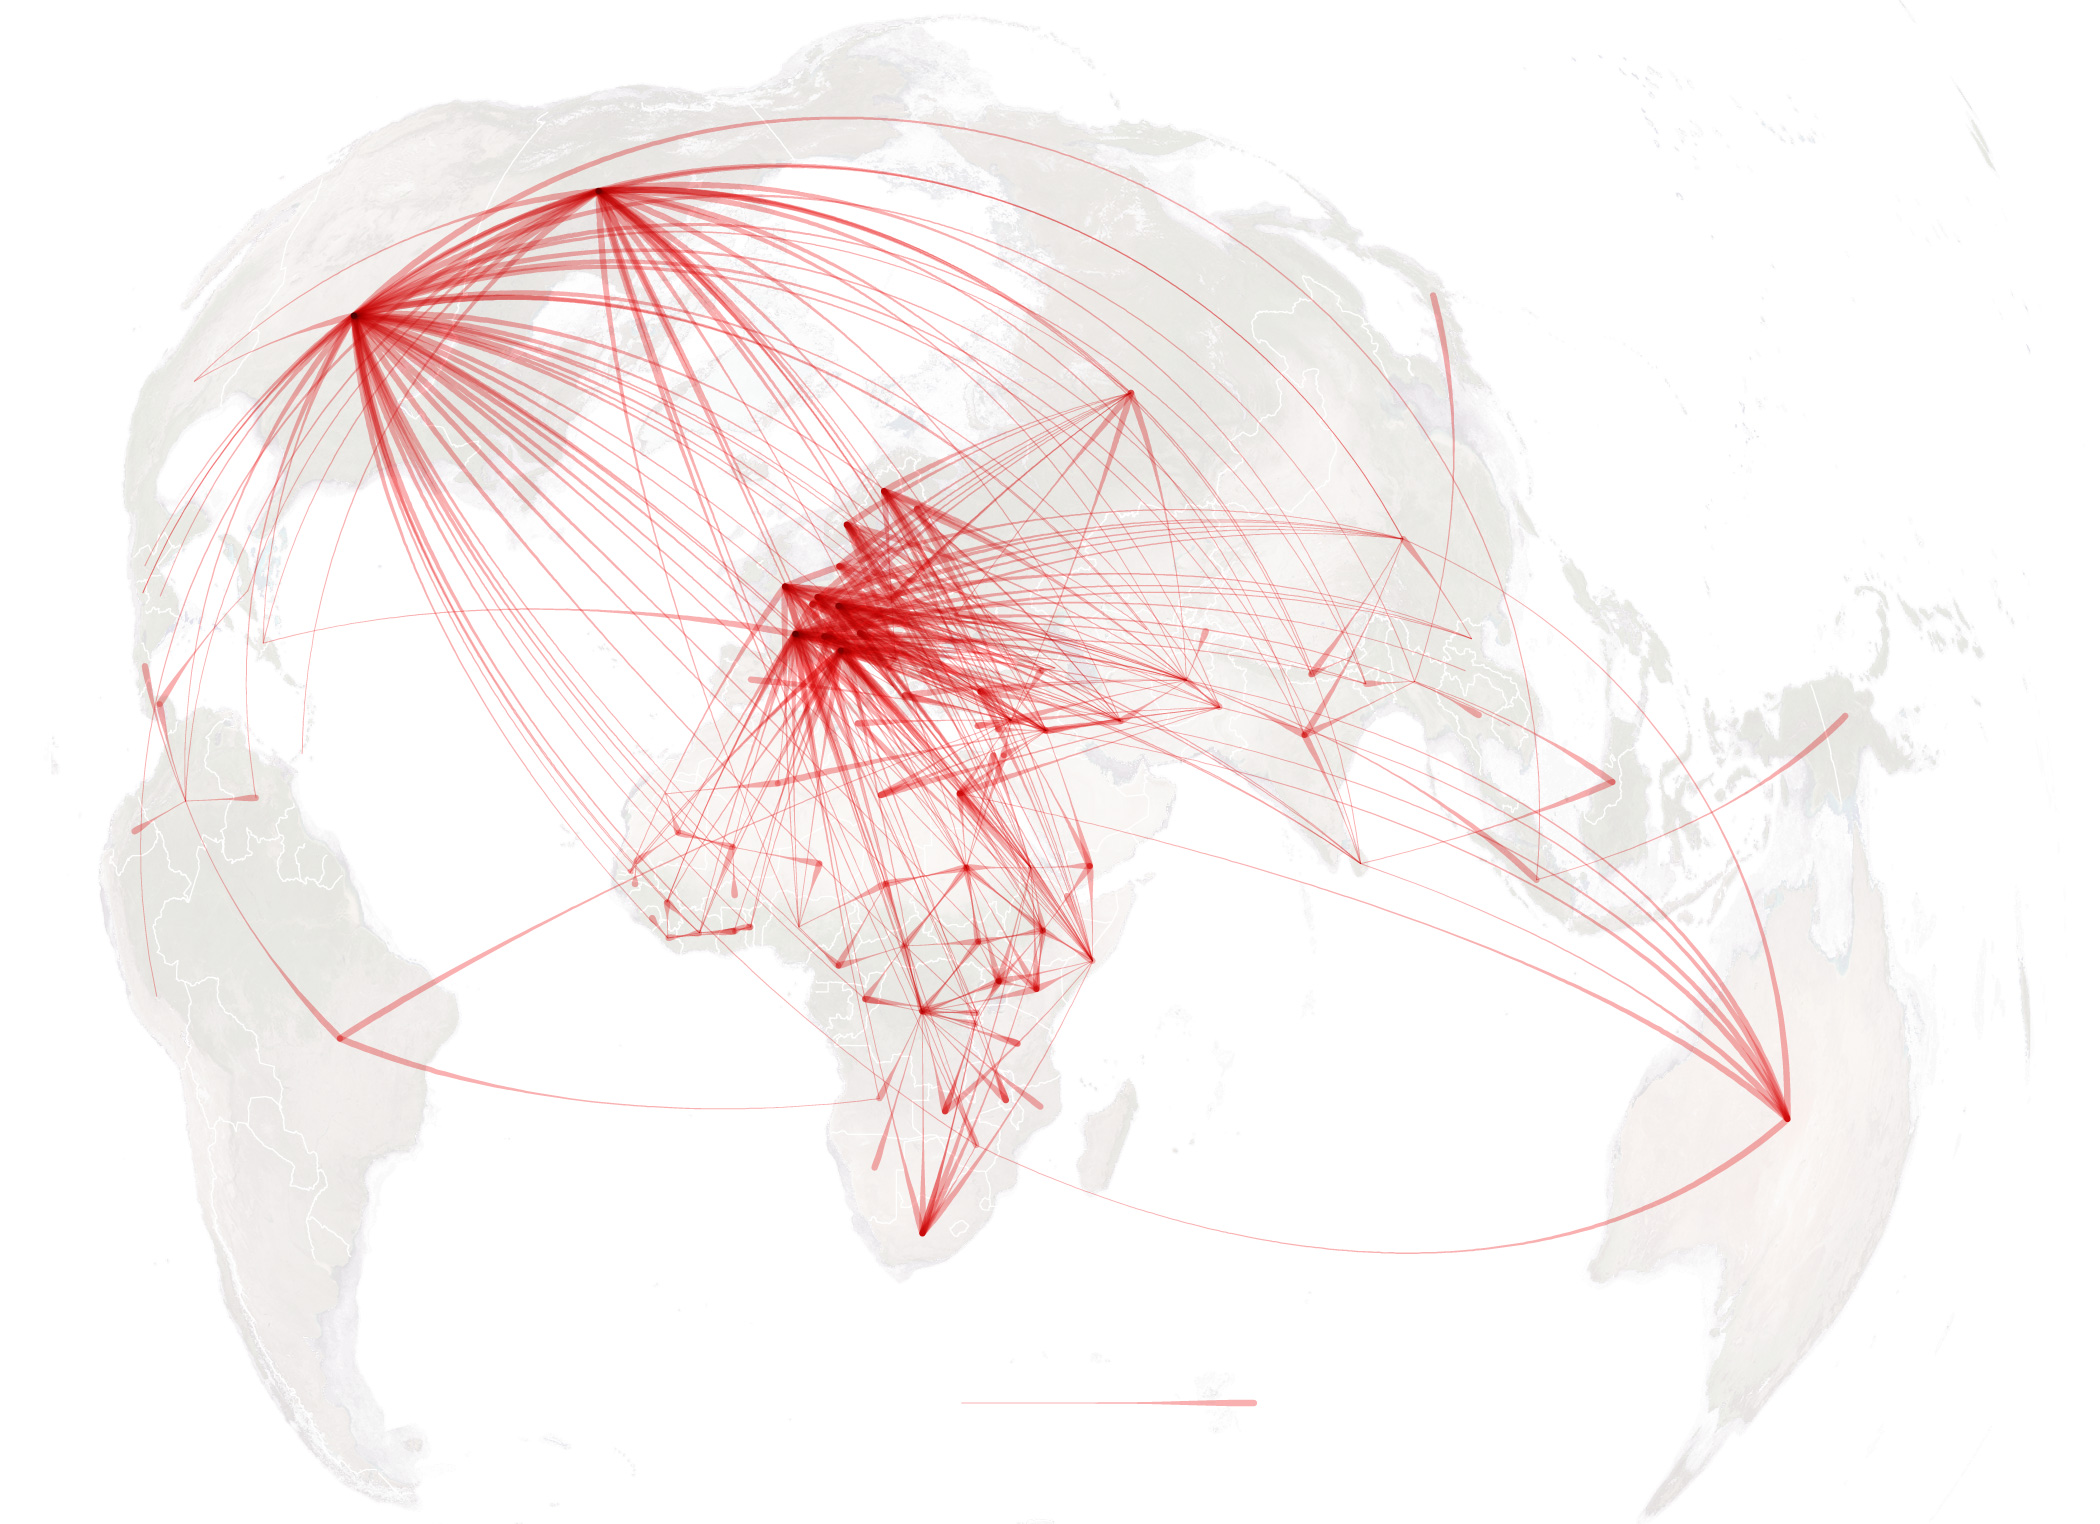 refugee_flow_map-africa